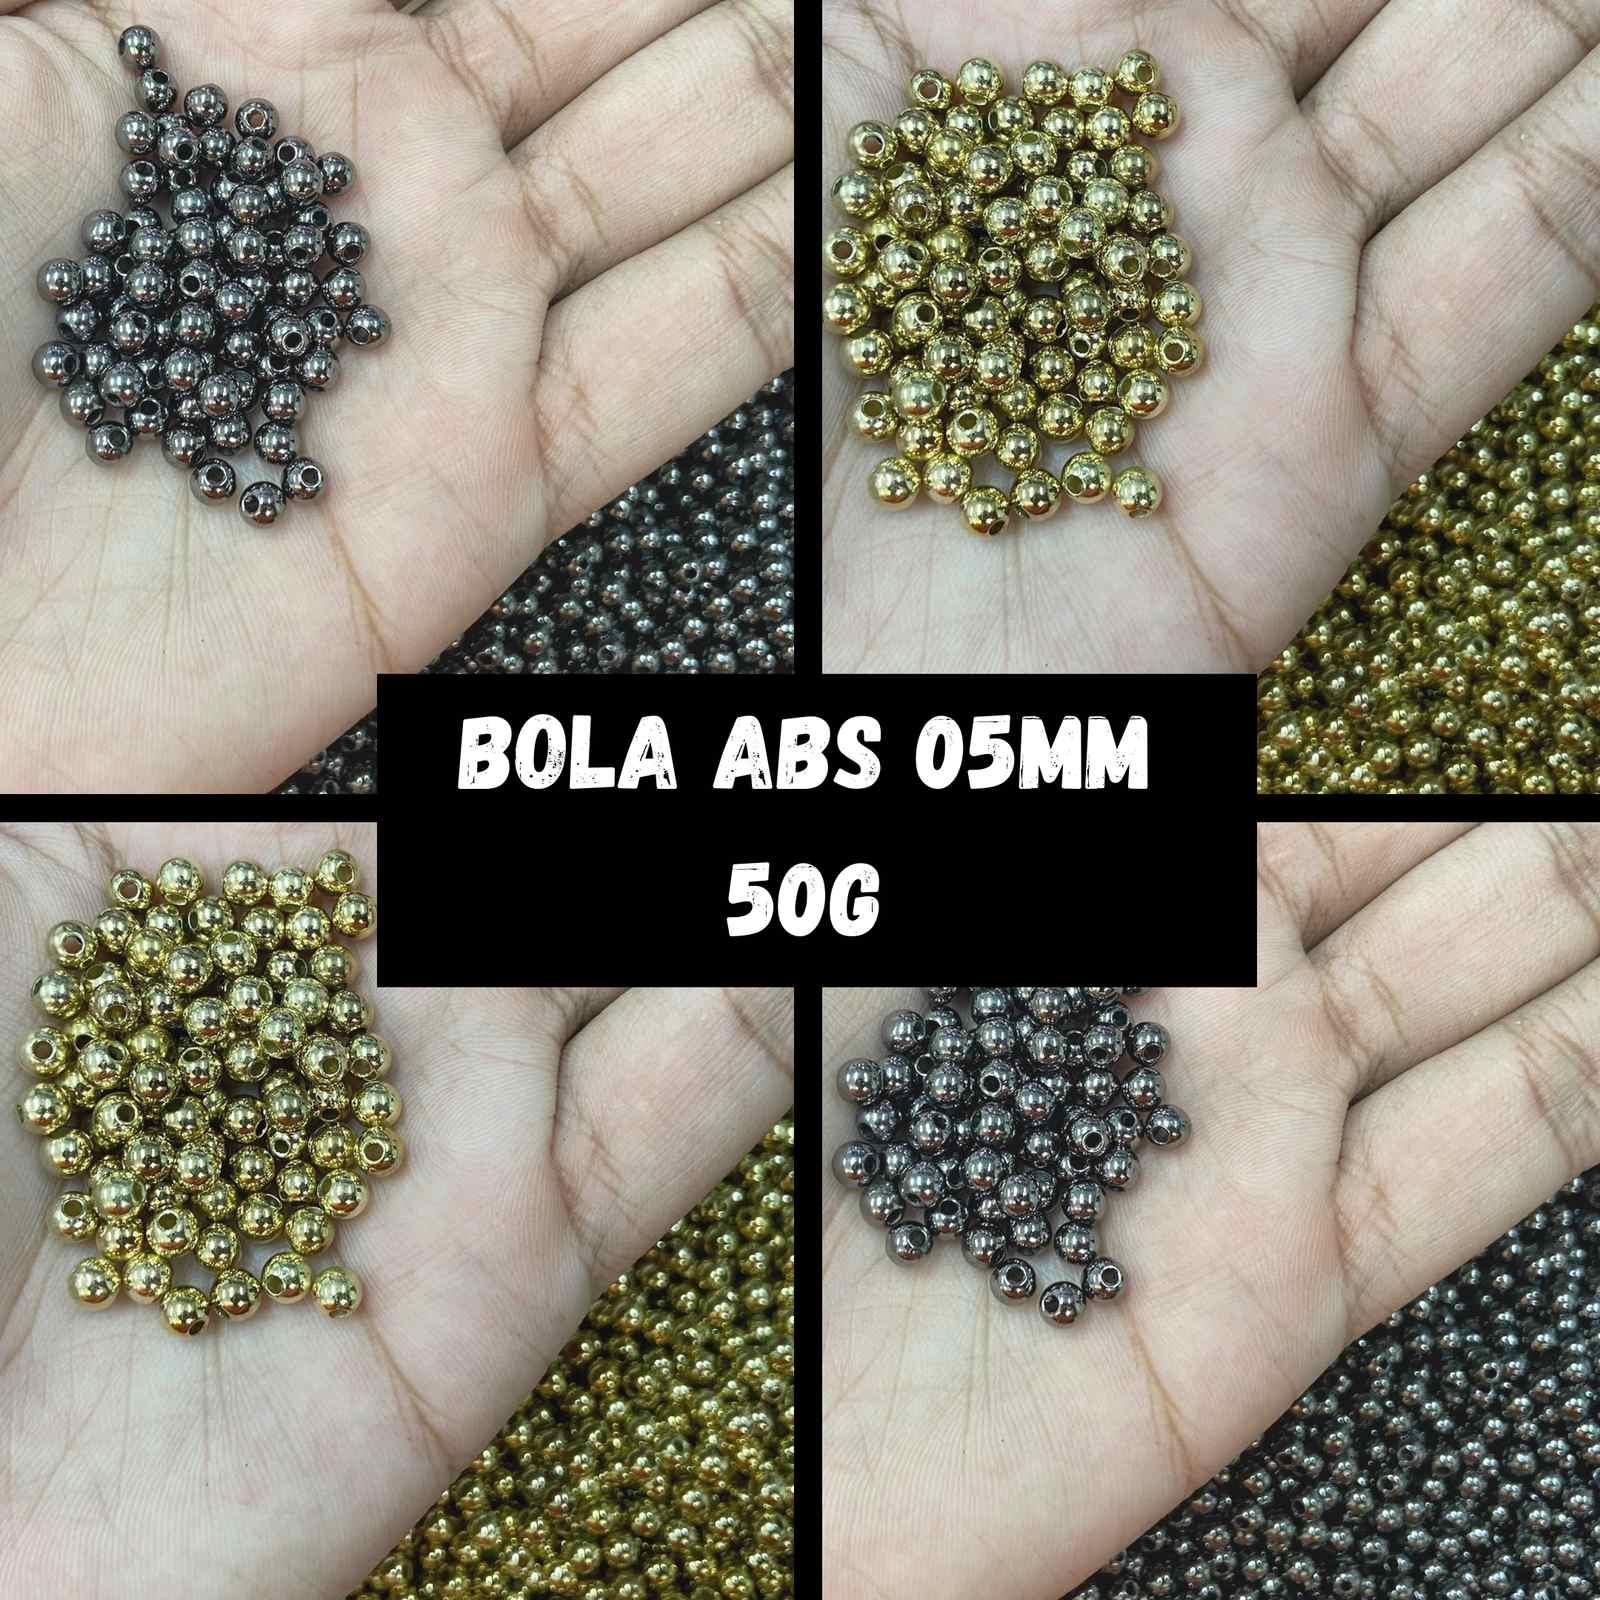 Bola ABS Metalizada 5mm - 50g